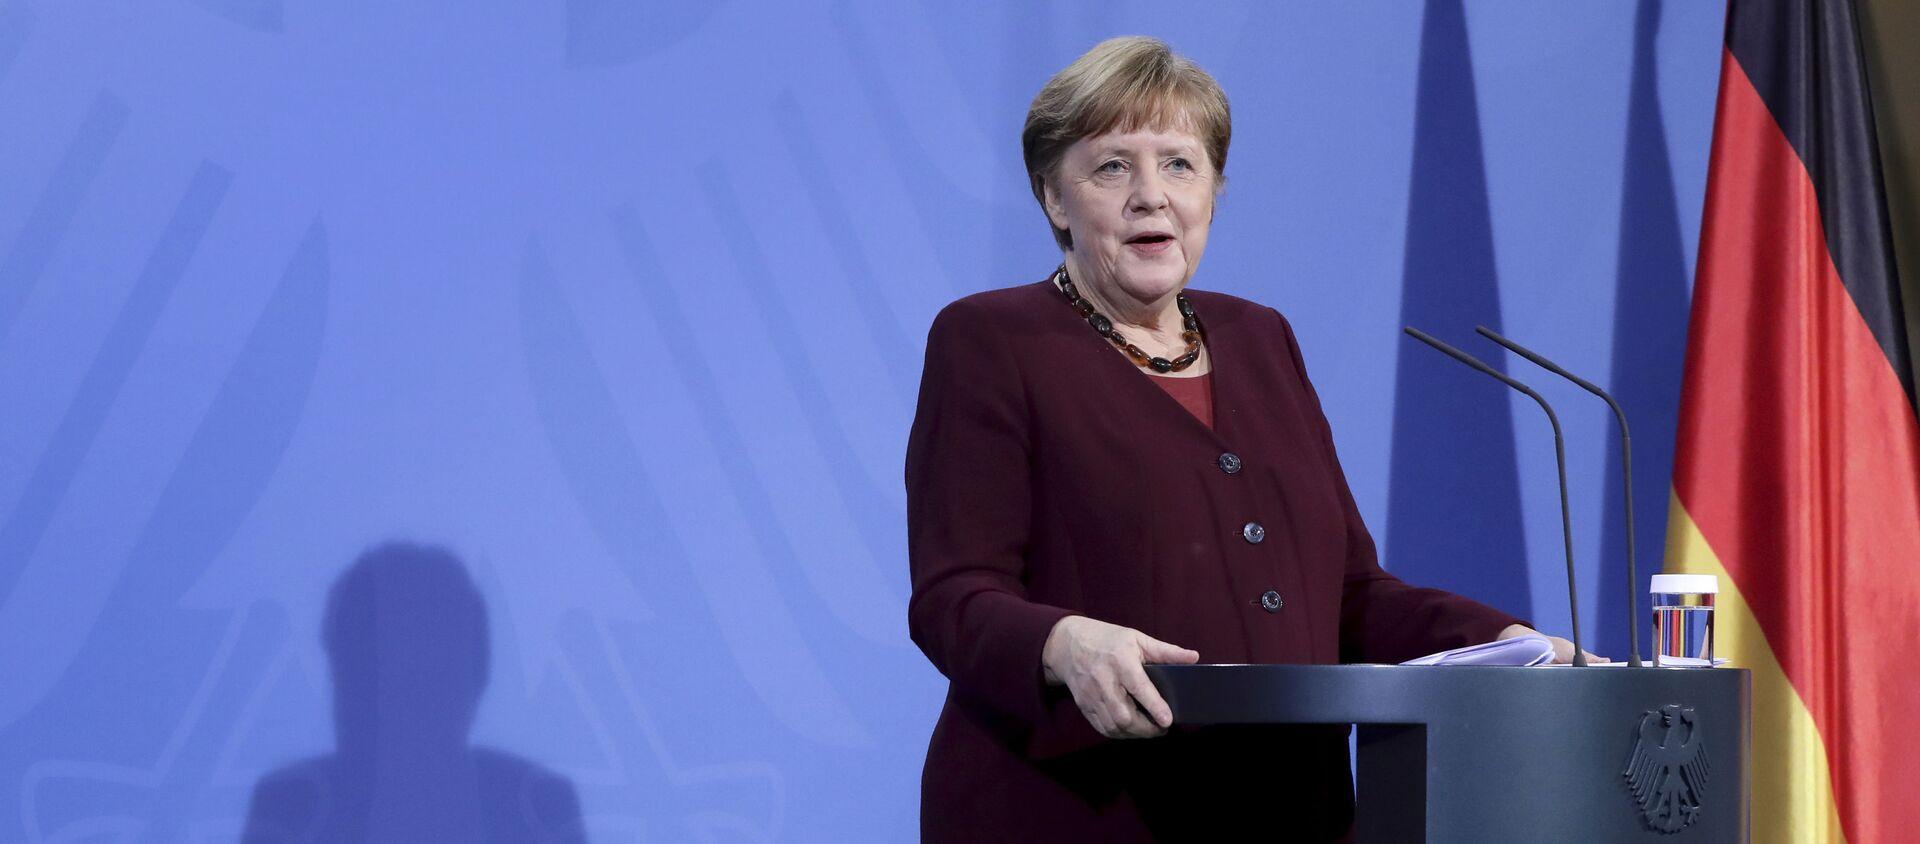 Канцлер Германии Ангела Меркель, фото из архива - Sputnik Азербайджан, 1920, 14.04.2021